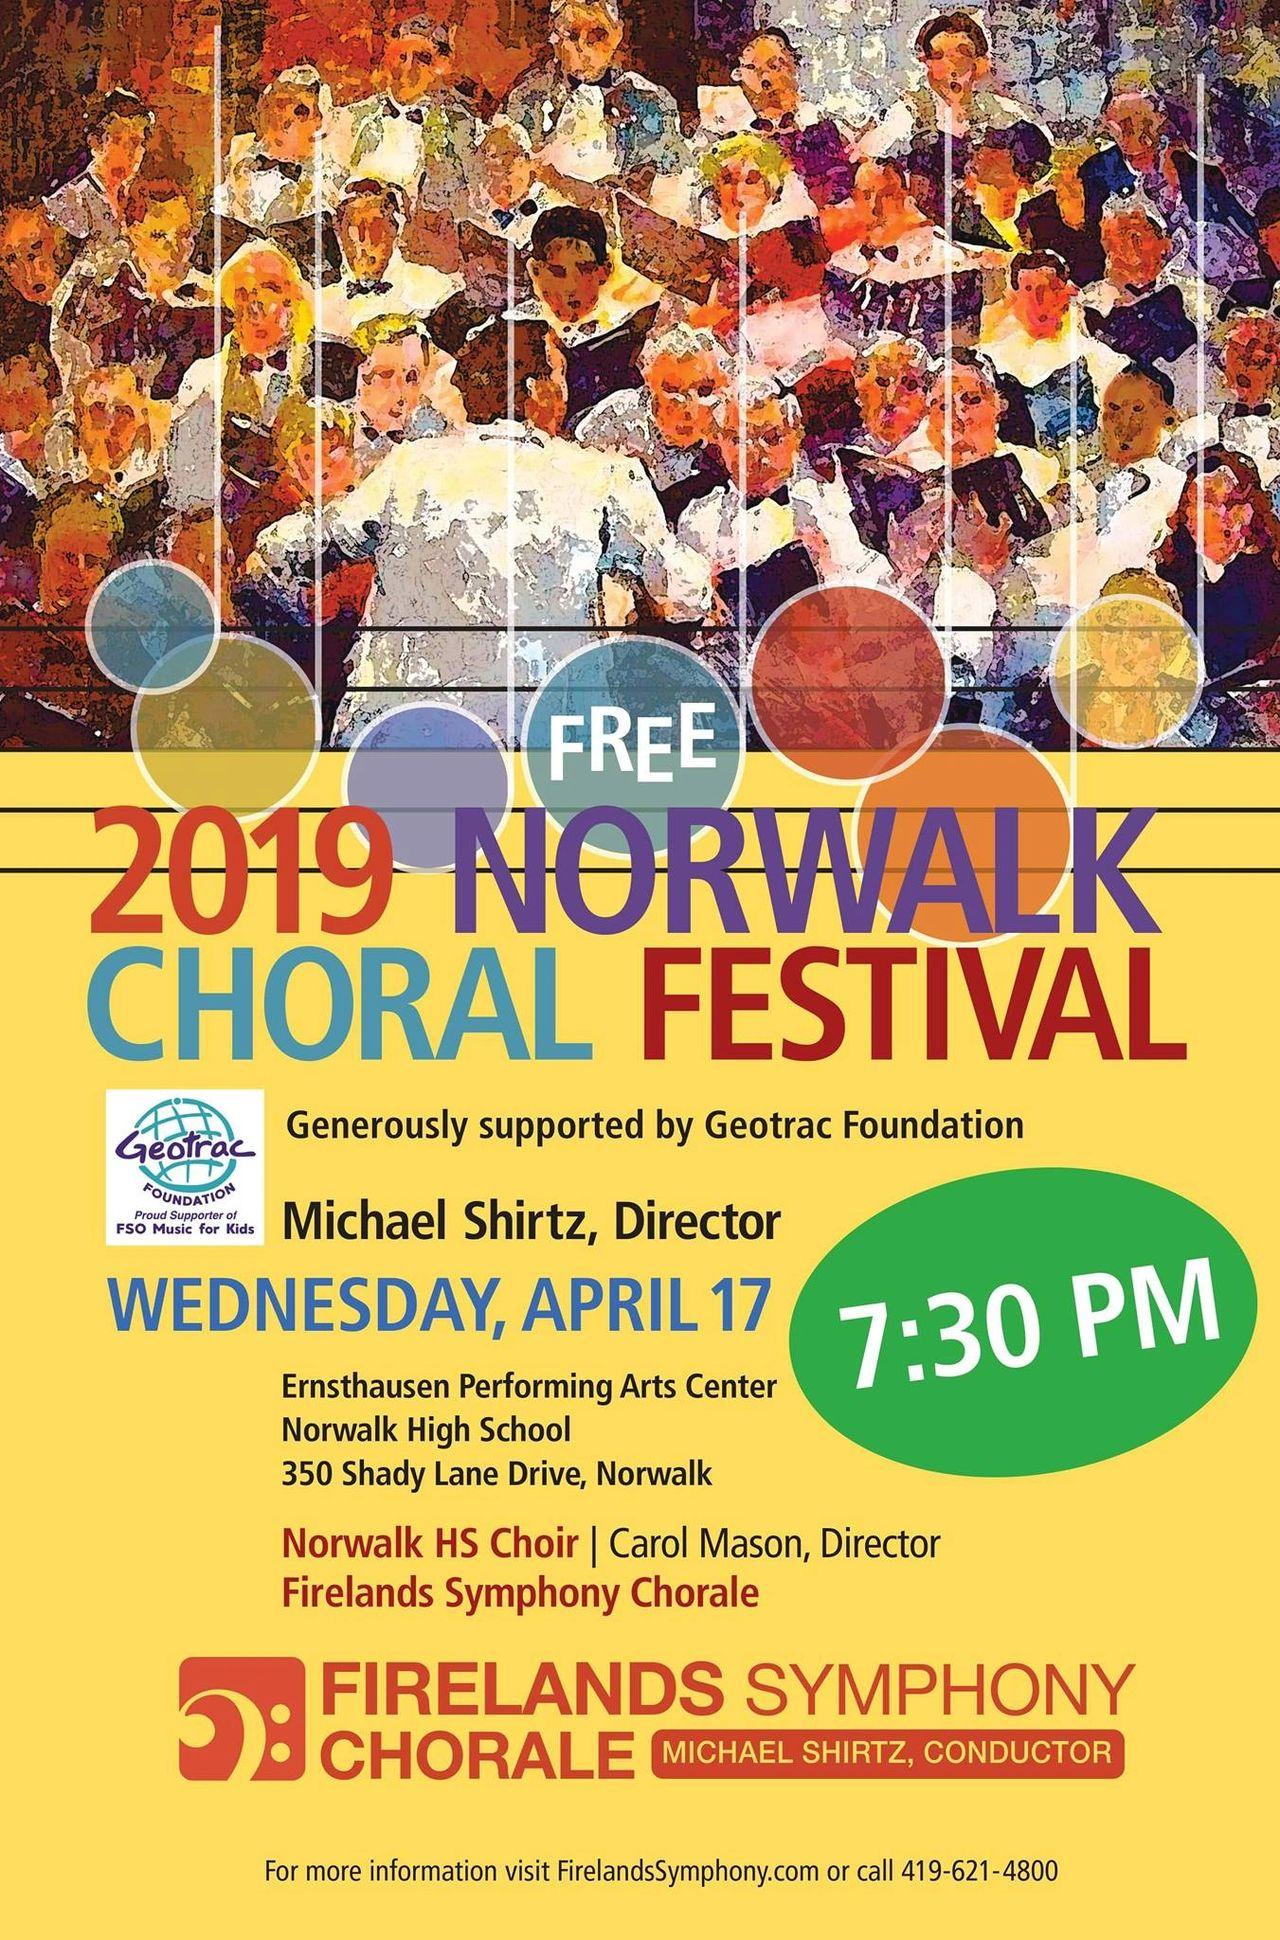 Norwalk Choral Festival